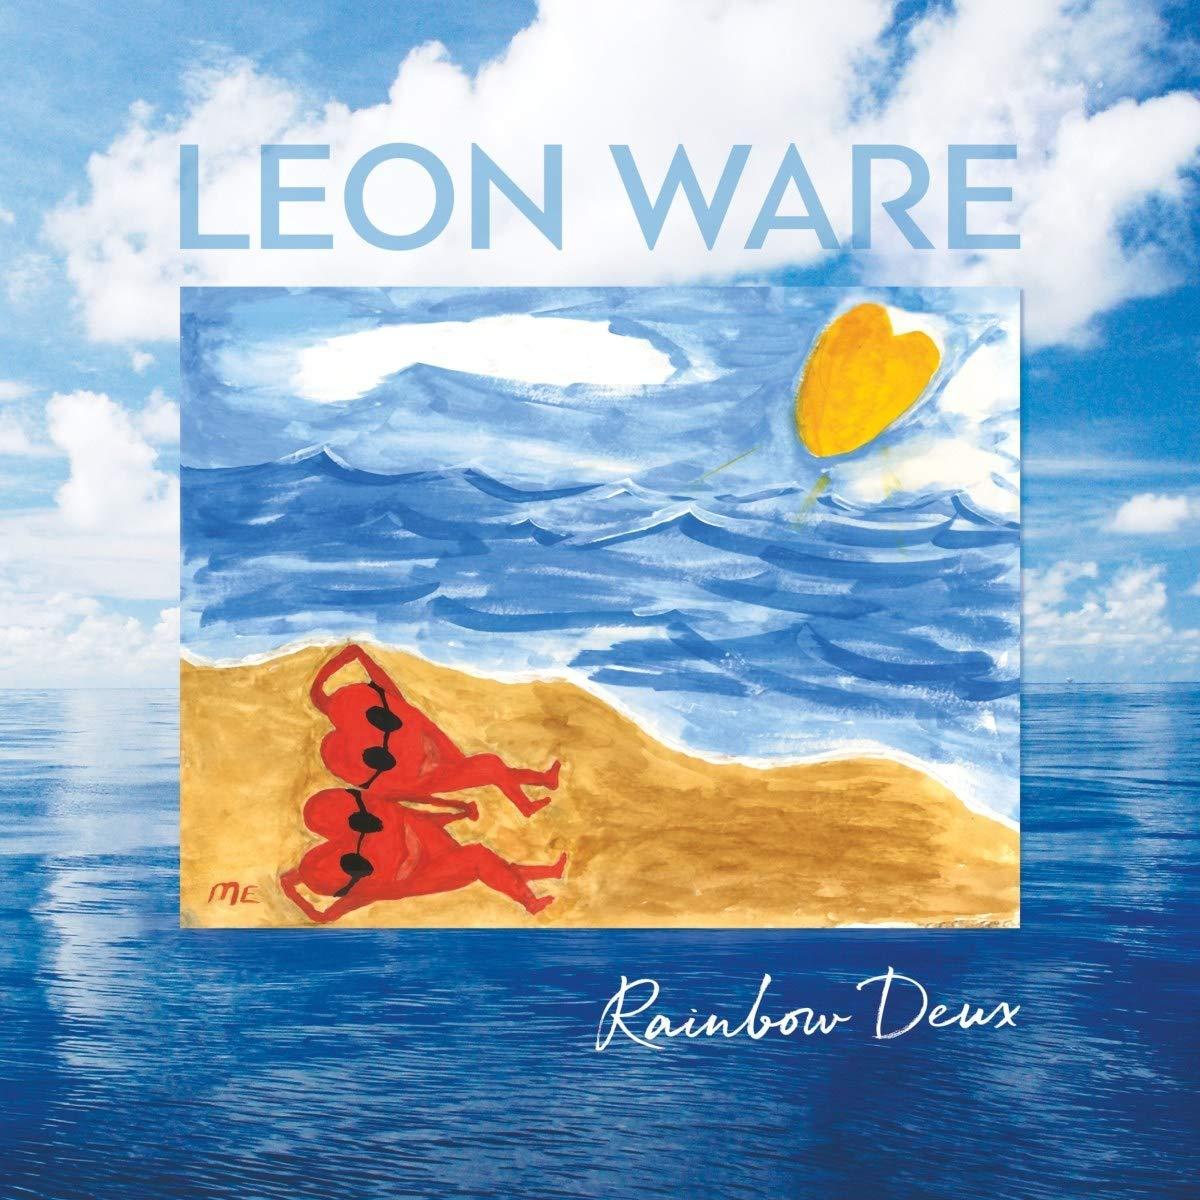 leon ware_rainbow deux